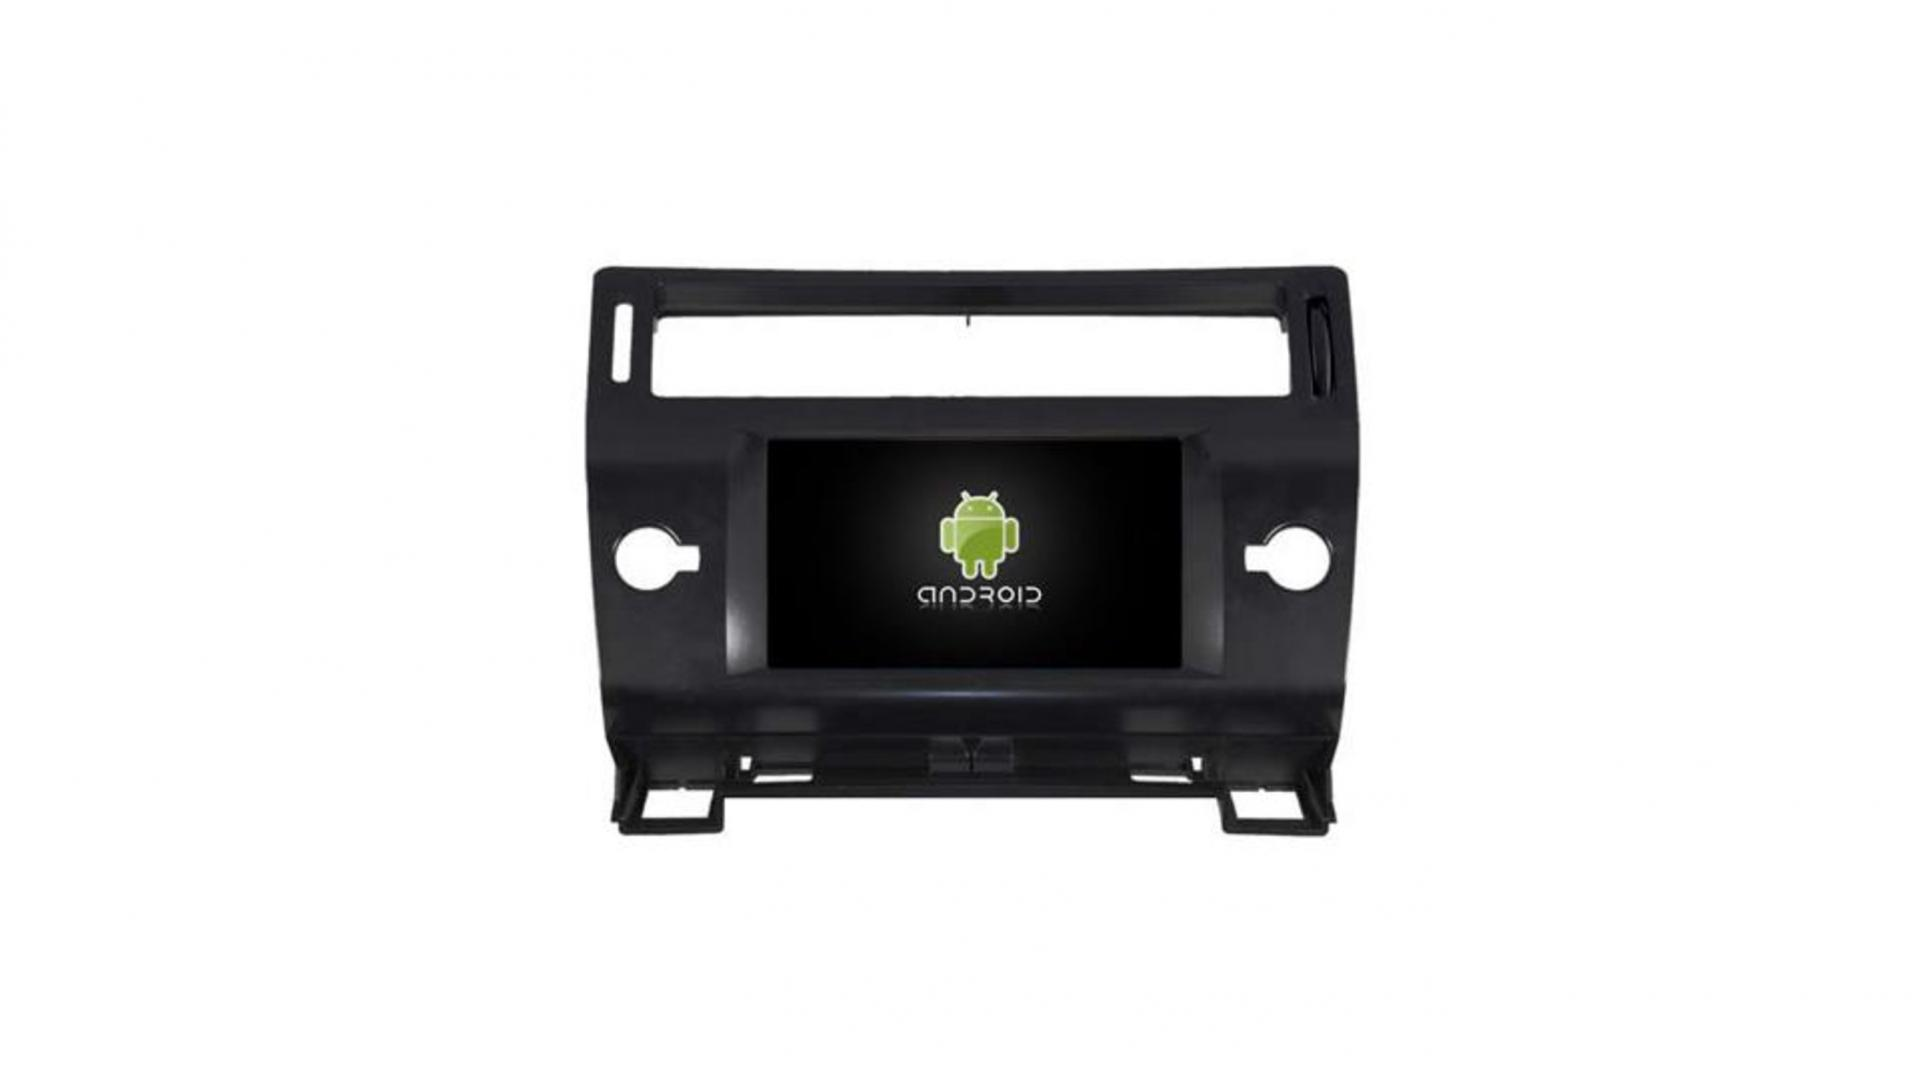 Citroen c4 autoradio gps bluetooth android auto carplay camera de recul commande au volant1